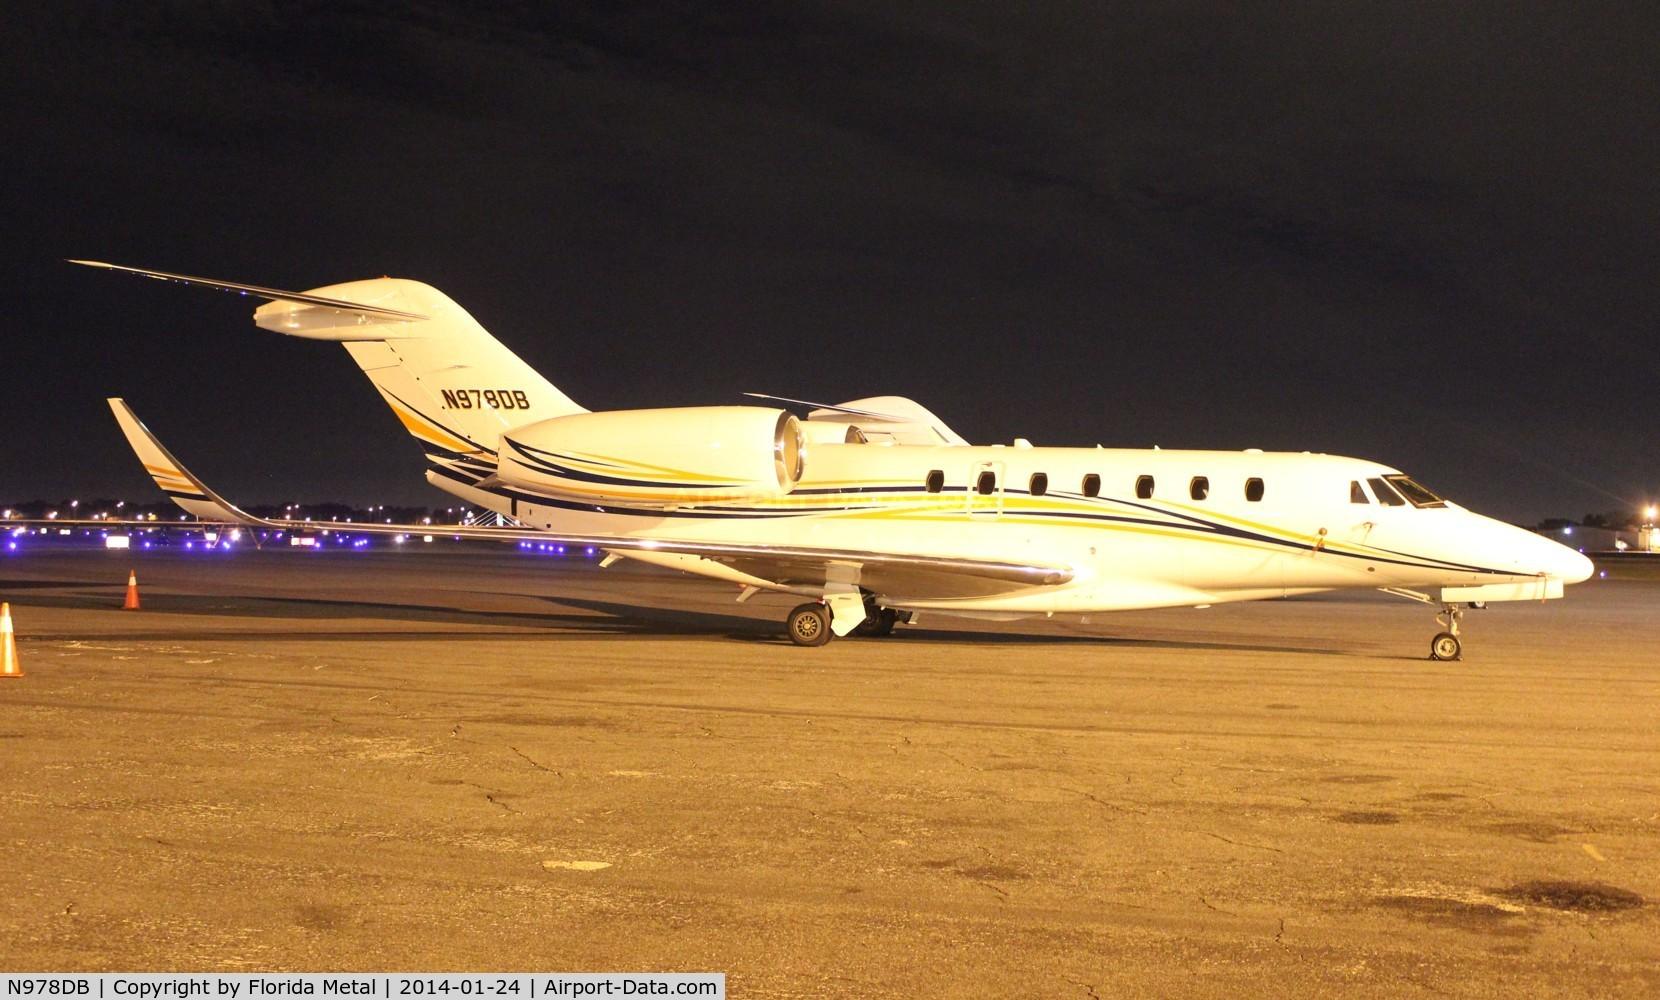 N978DB, 1996 Cessna 750 C/N 750-0009, Citation X